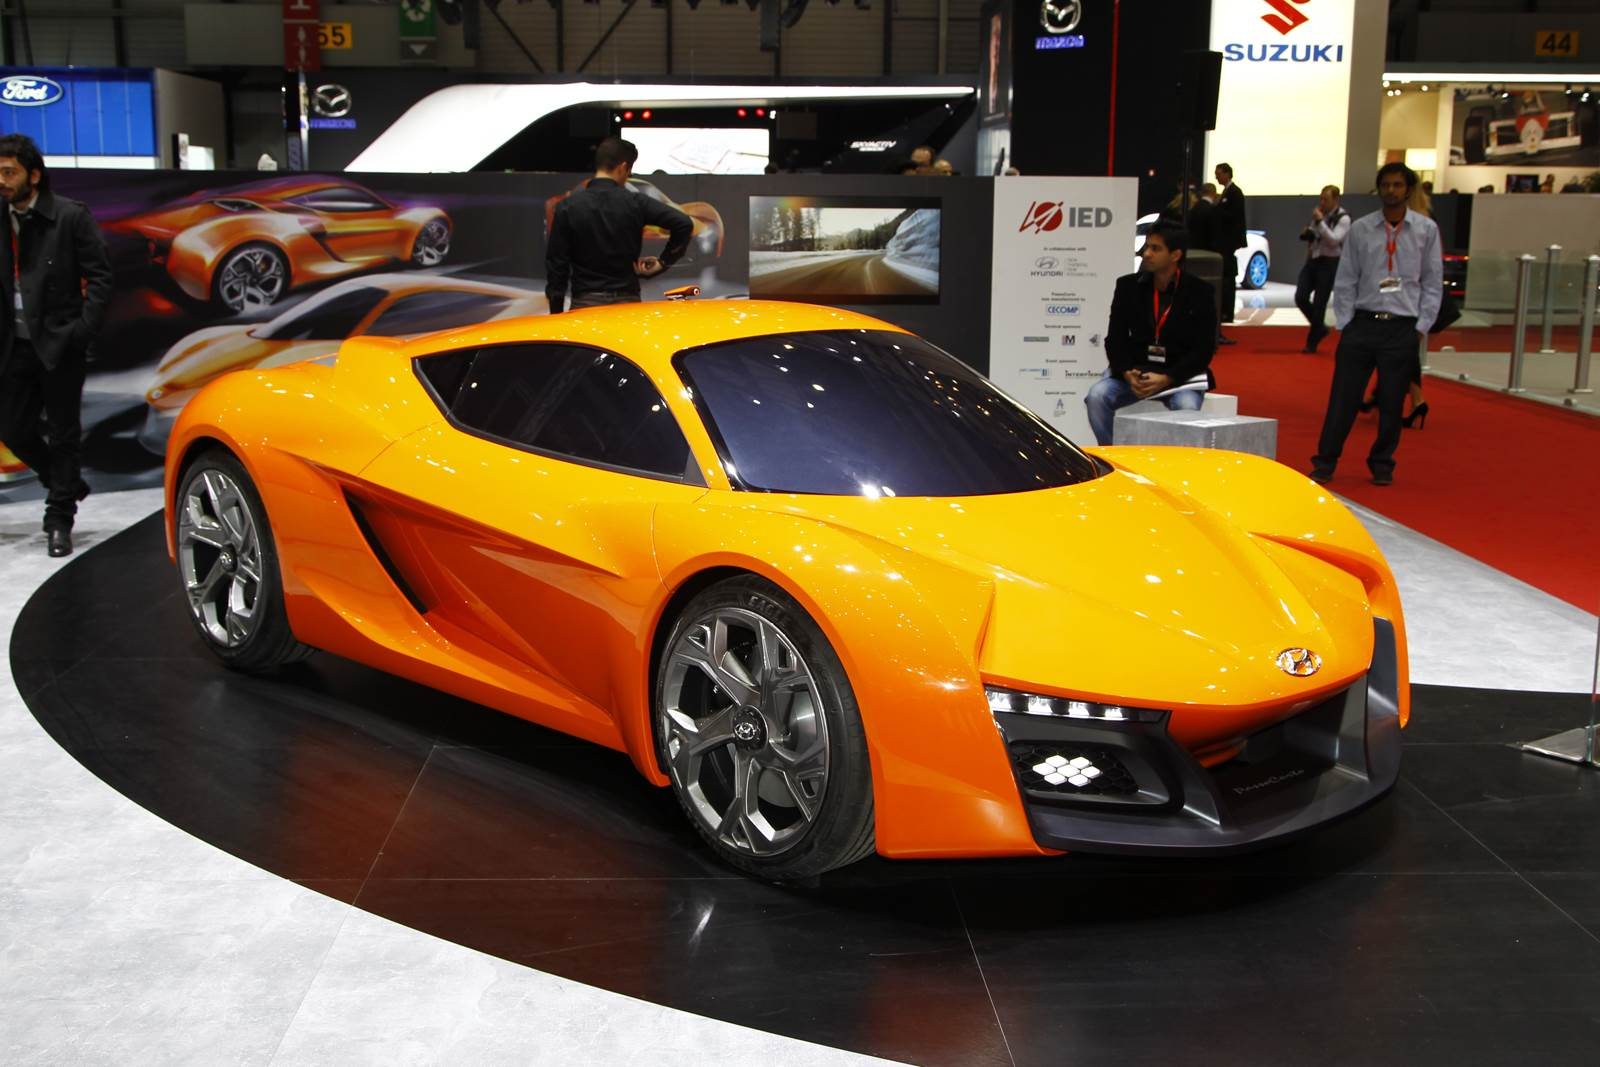 Geneva 2014: Hyundai PassoCorto concept shown